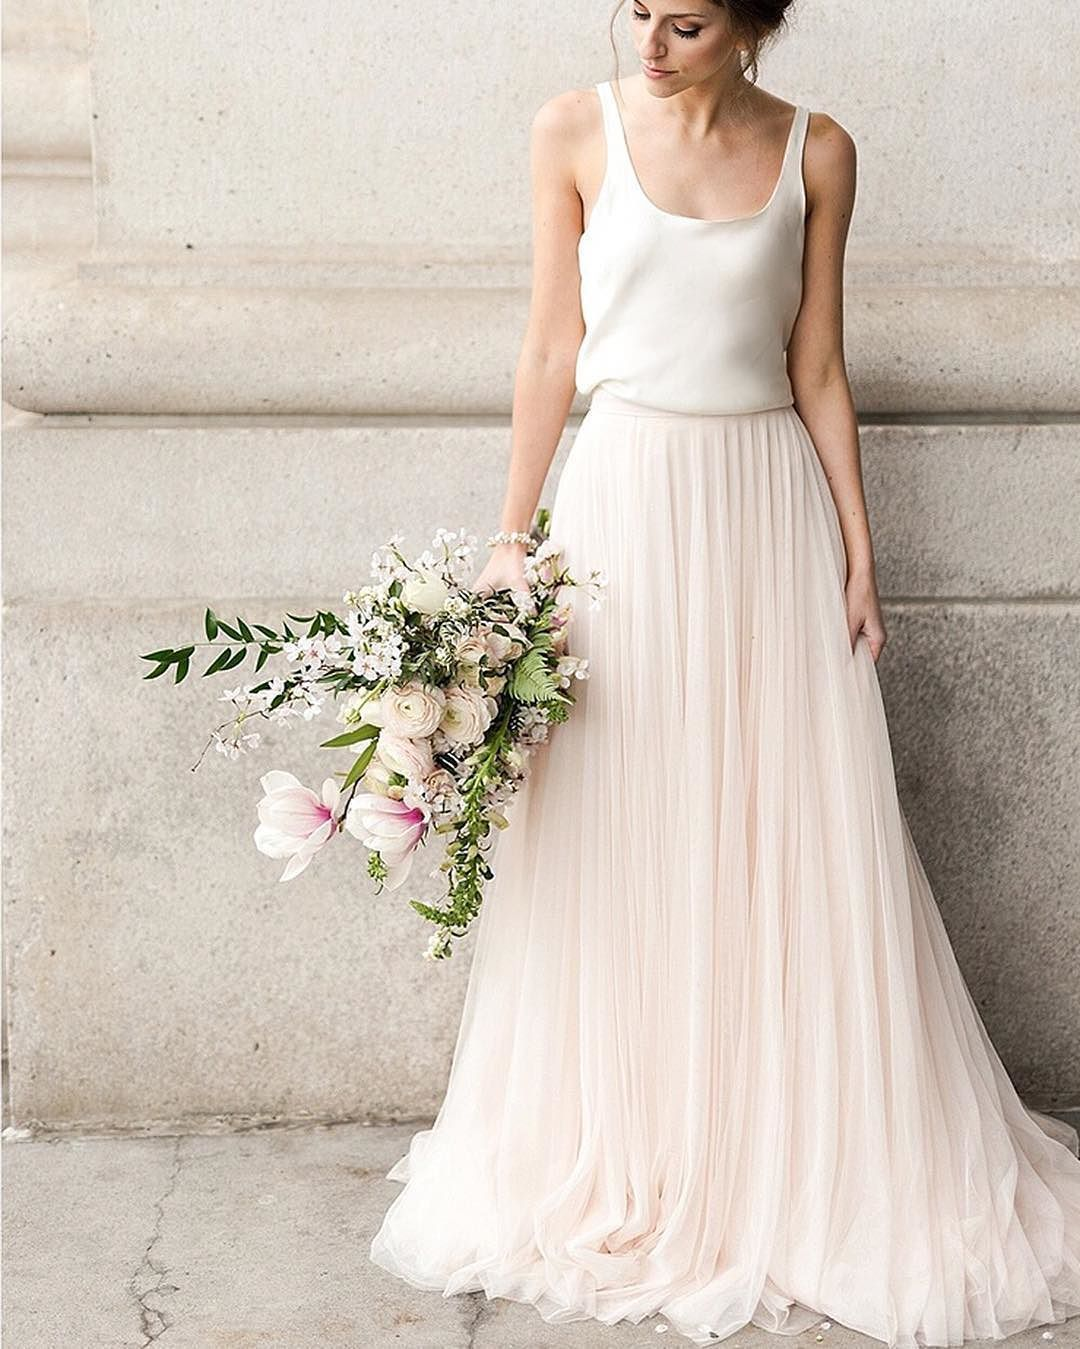 Casual hippie wedding dresses  weddingideas  Wedding  Pinterest  Wedding Wedding dresses and Bridal